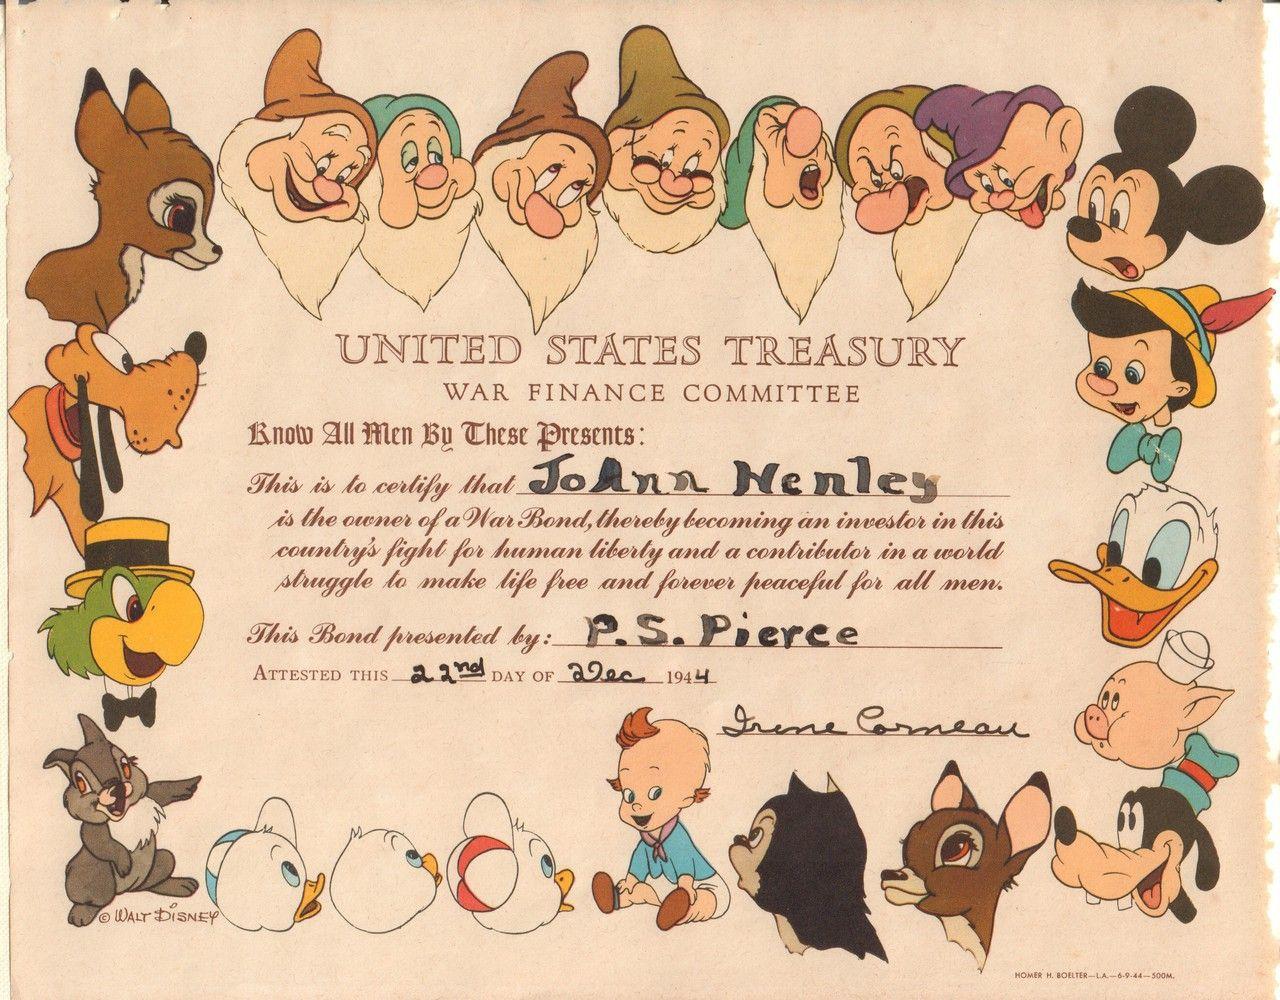 United States Treasury War Finance Committee Cert. circa